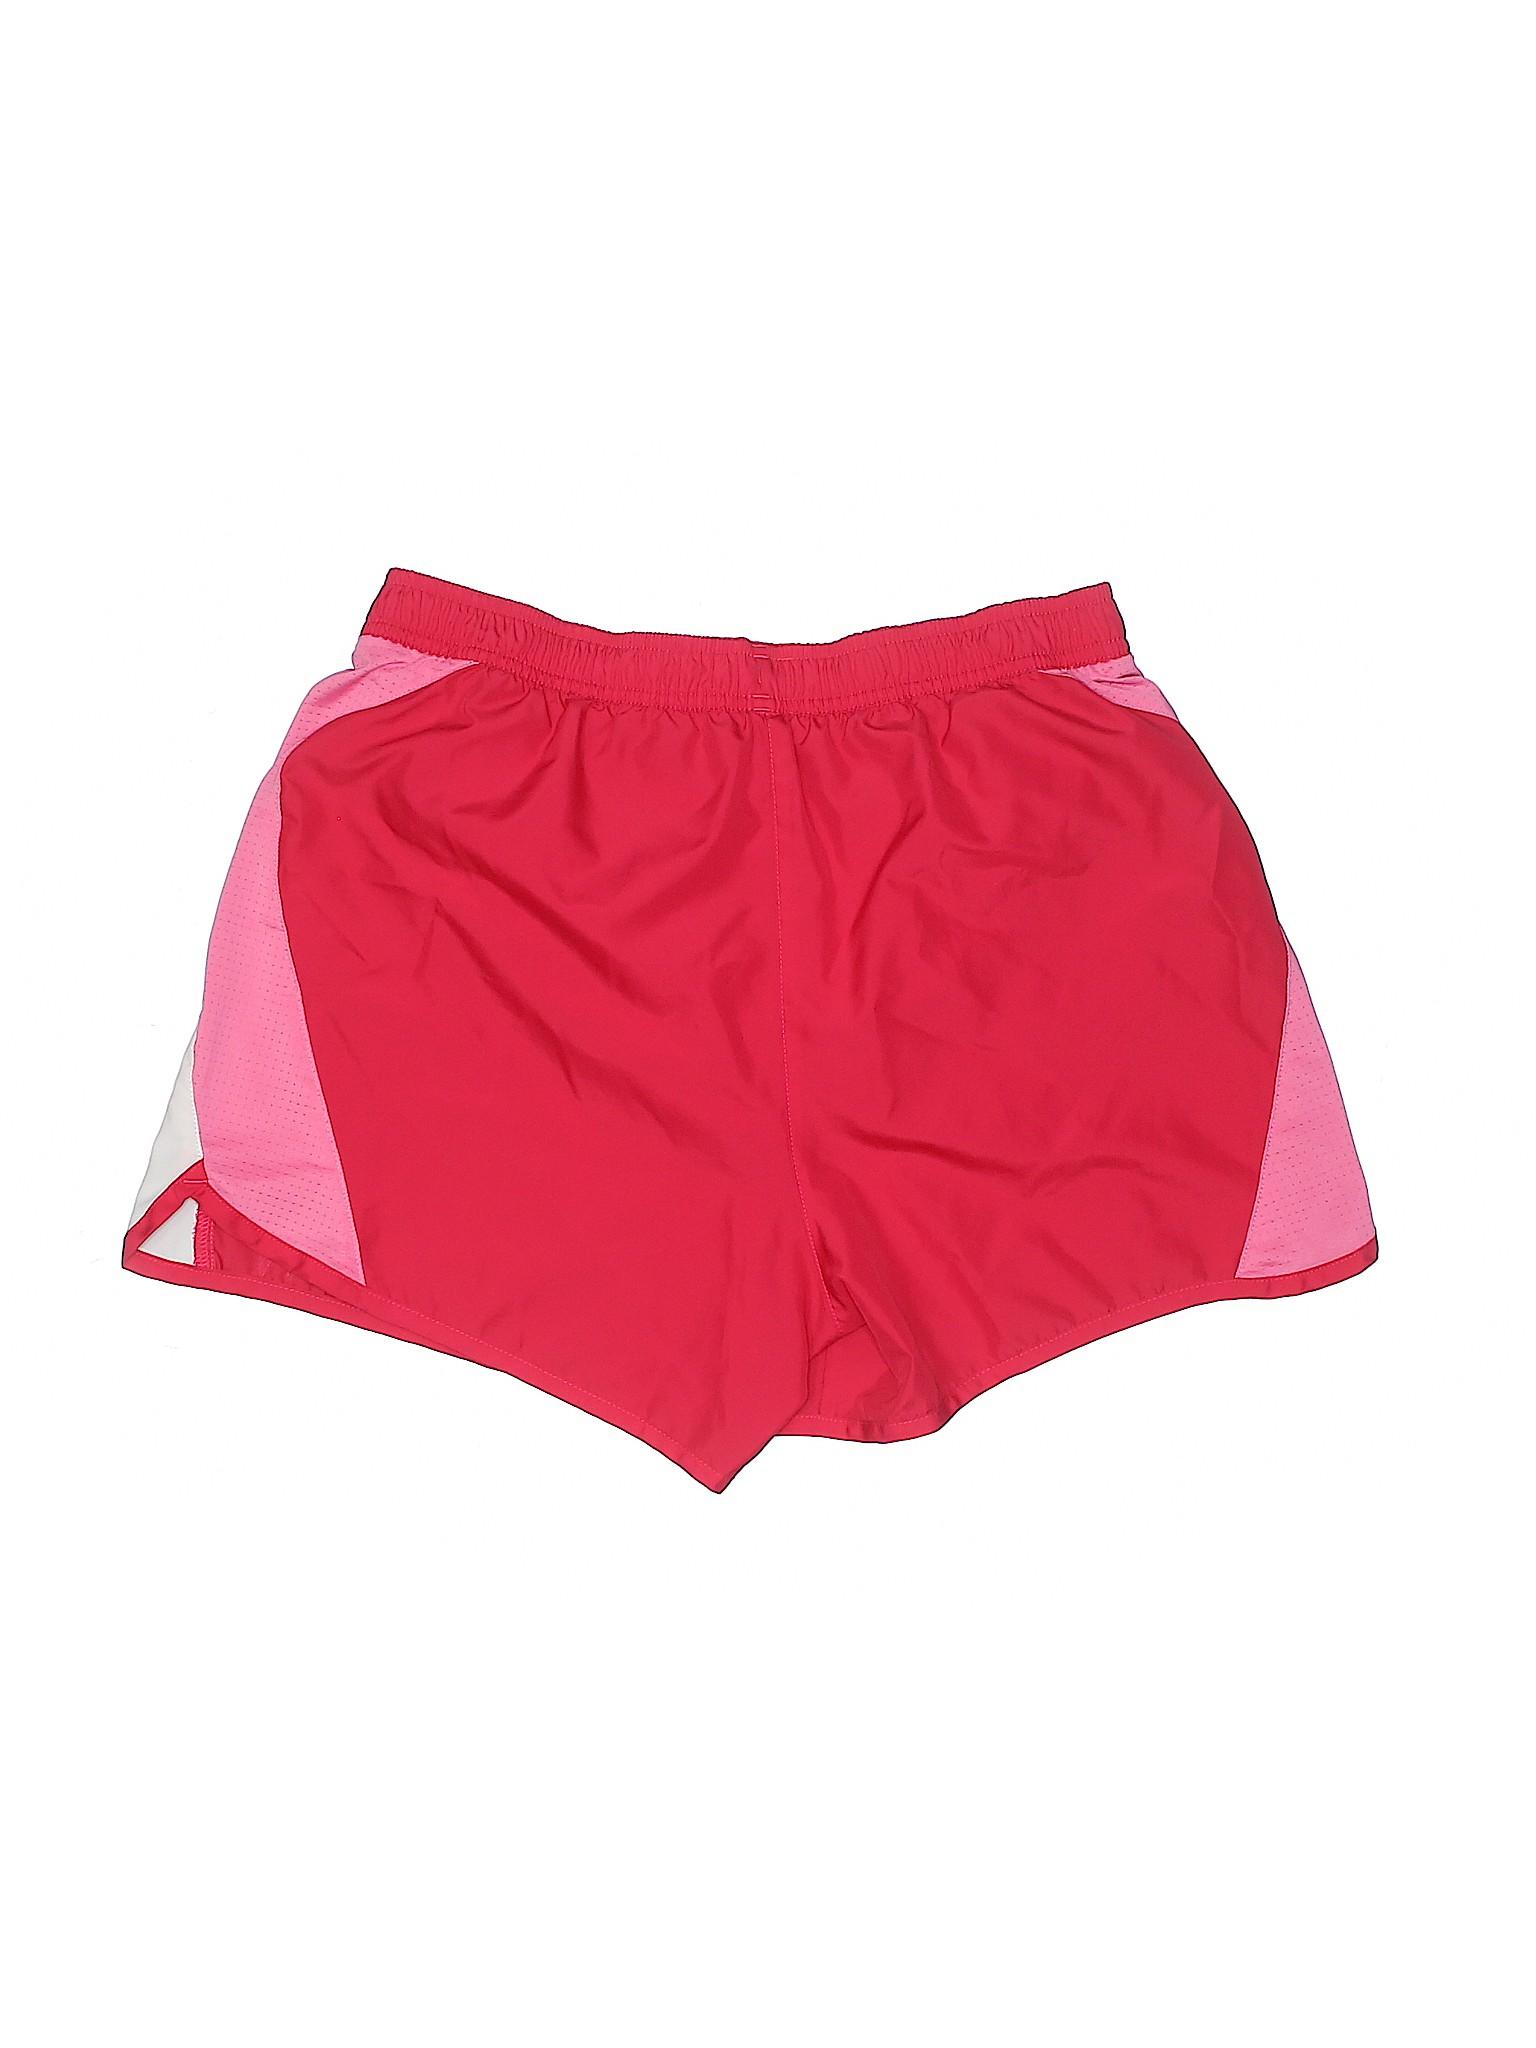 Athletic Boutique Adidas Shorts Boutique Boutique Athletic Athletic Adidas Shorts Shorts Boutique Adidas xwxaqnSr